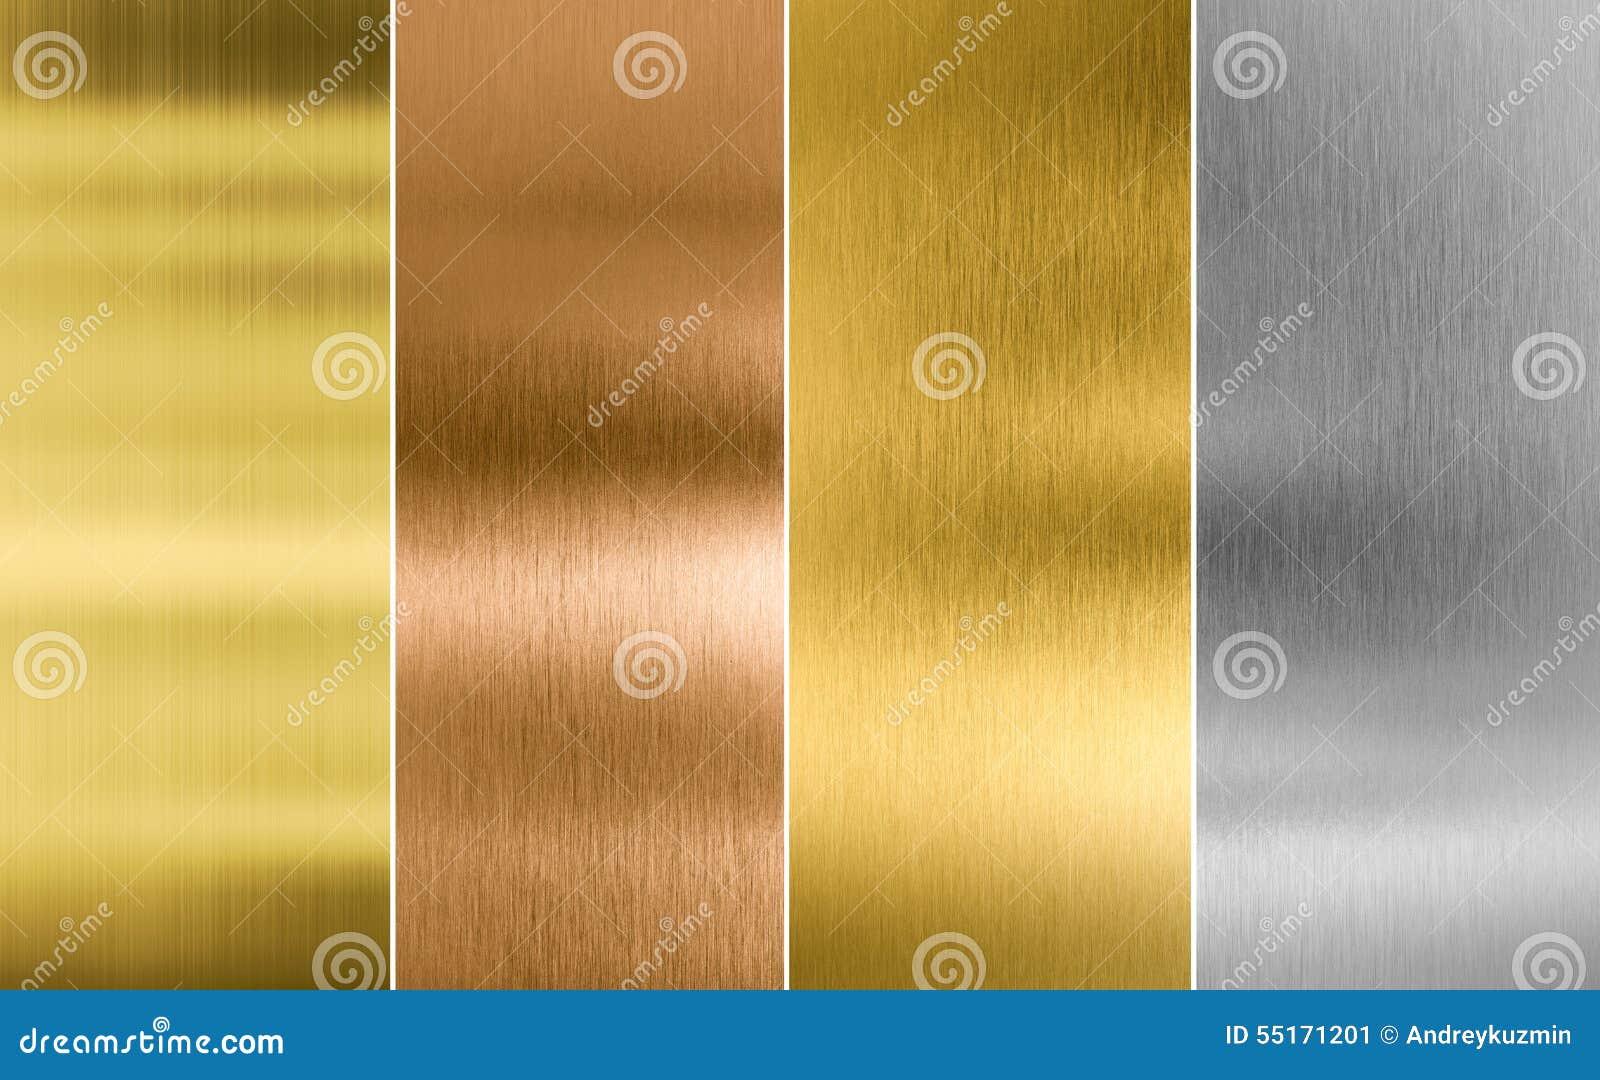 Сшитые серебр, золото и бронза metal текстура